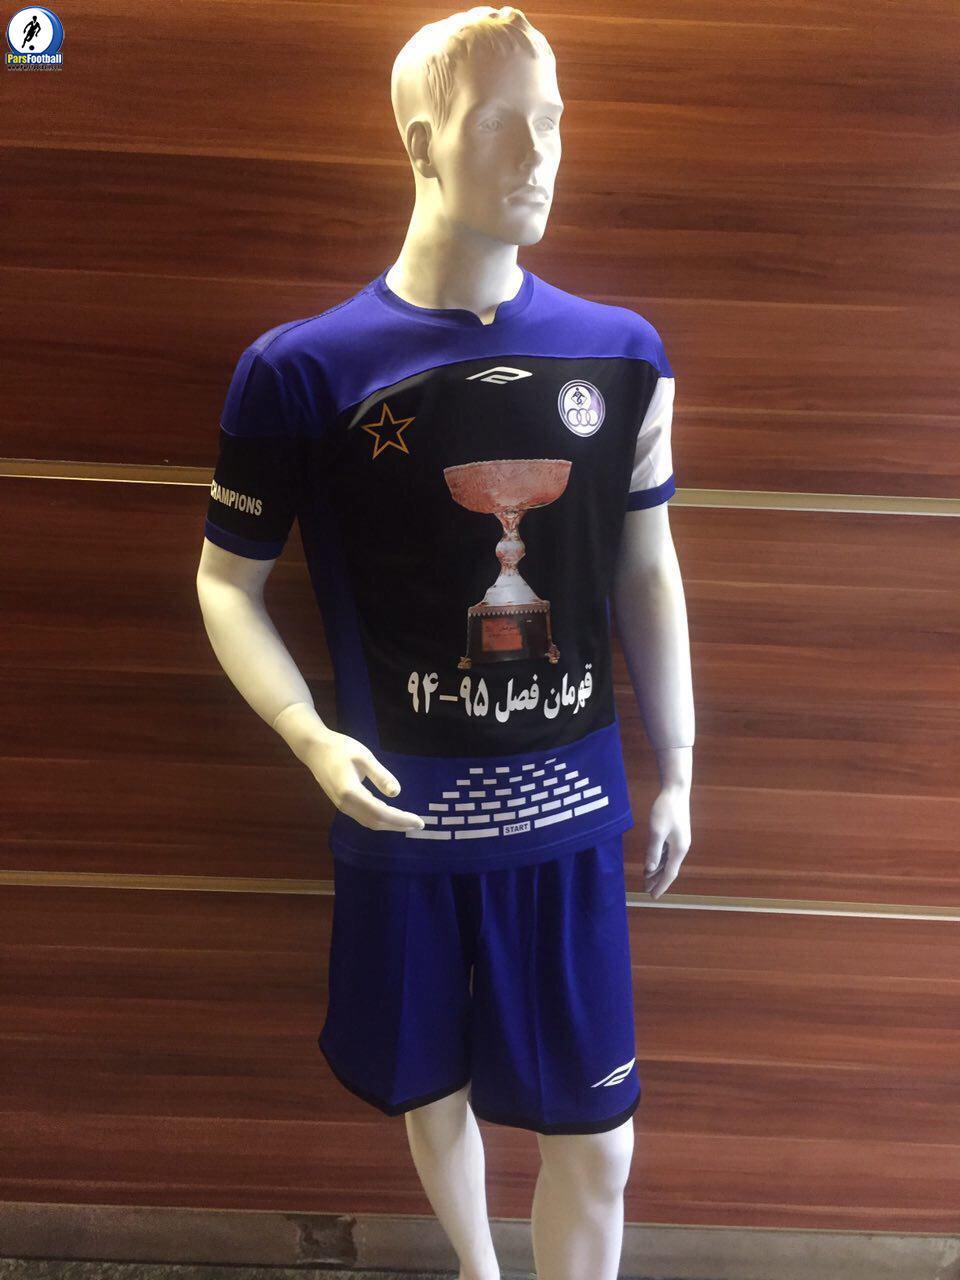 esteghlal khoozestan champion shirt